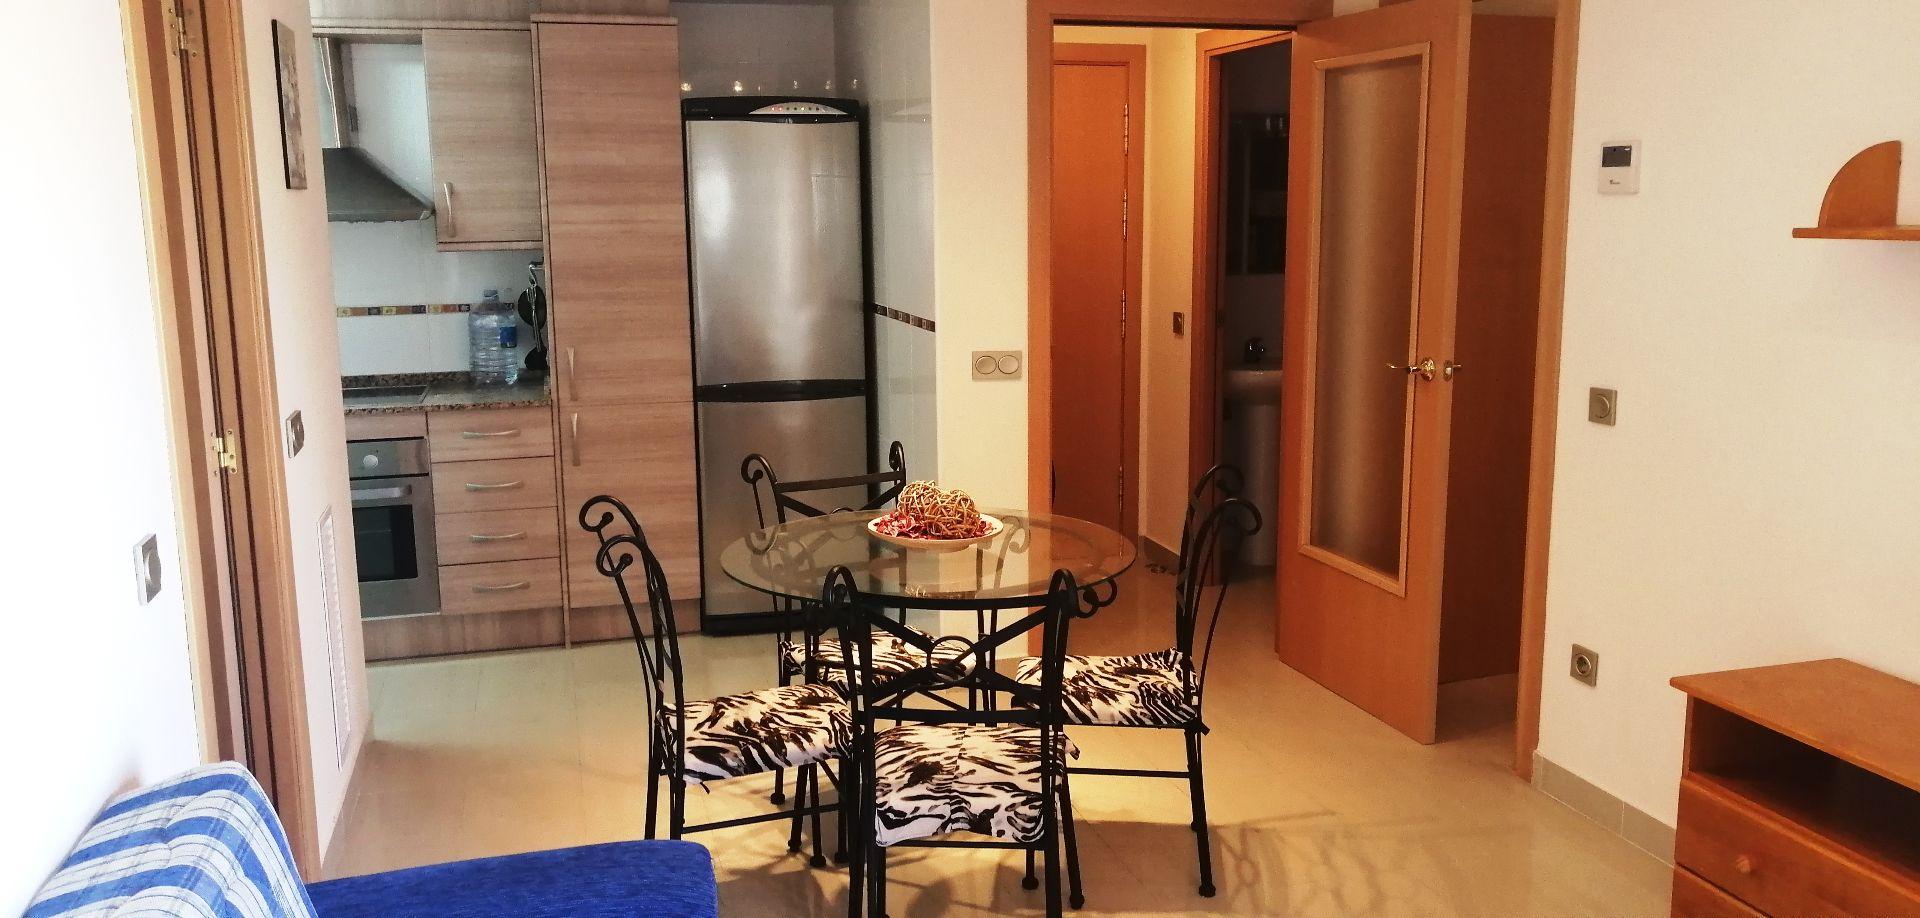 Alquiler Piso  Calle sant miquel. Apartamento de 2 h con piscina comunitaria.